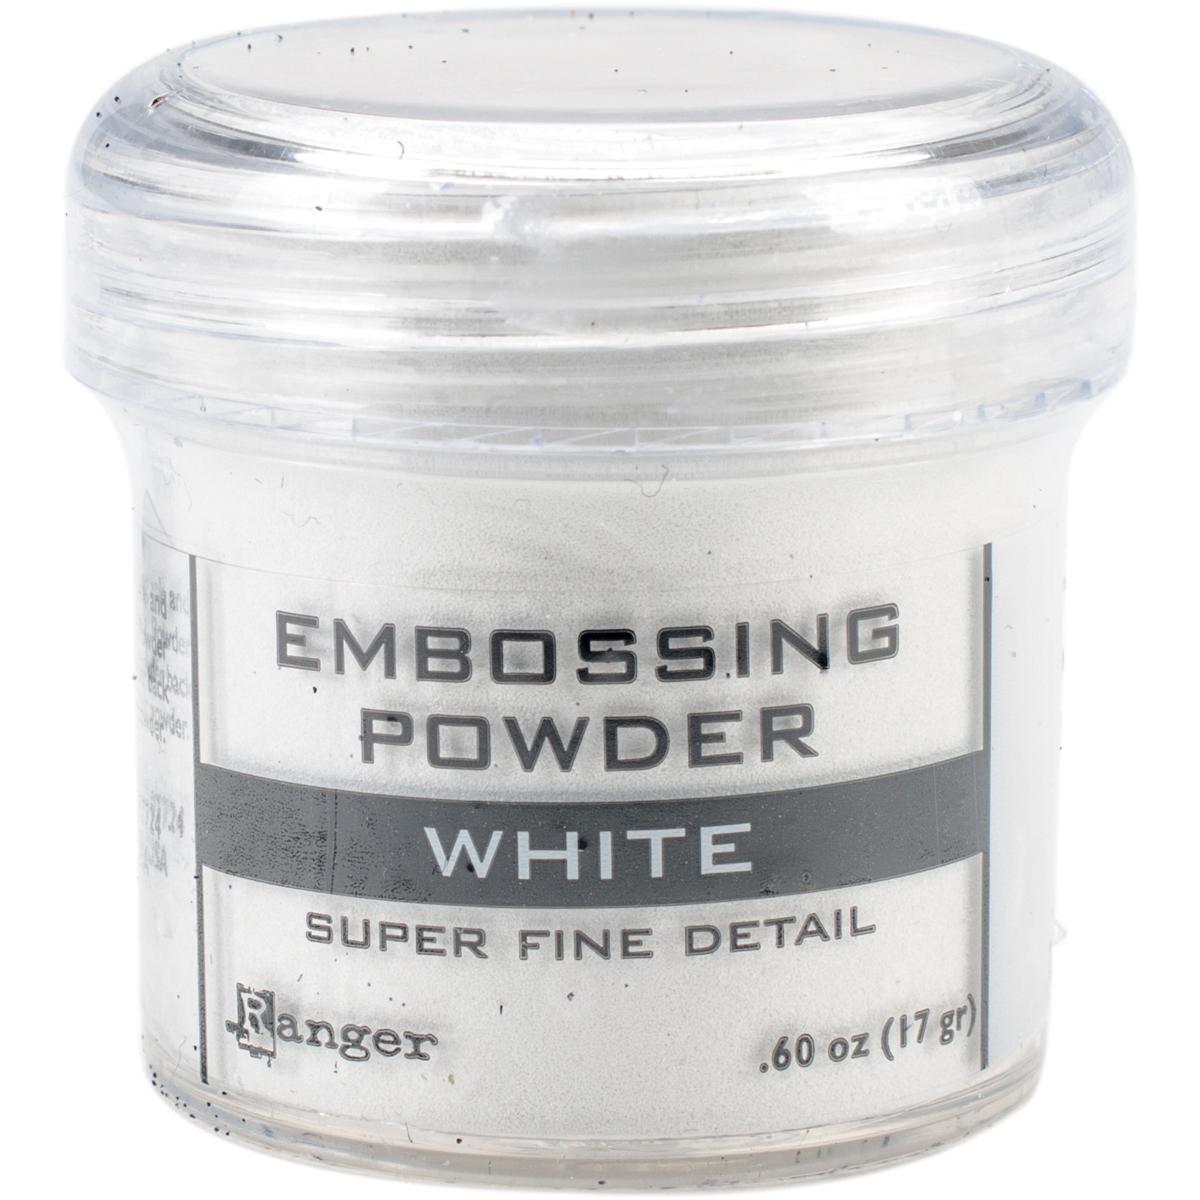 Super Fine White Embossing Powder